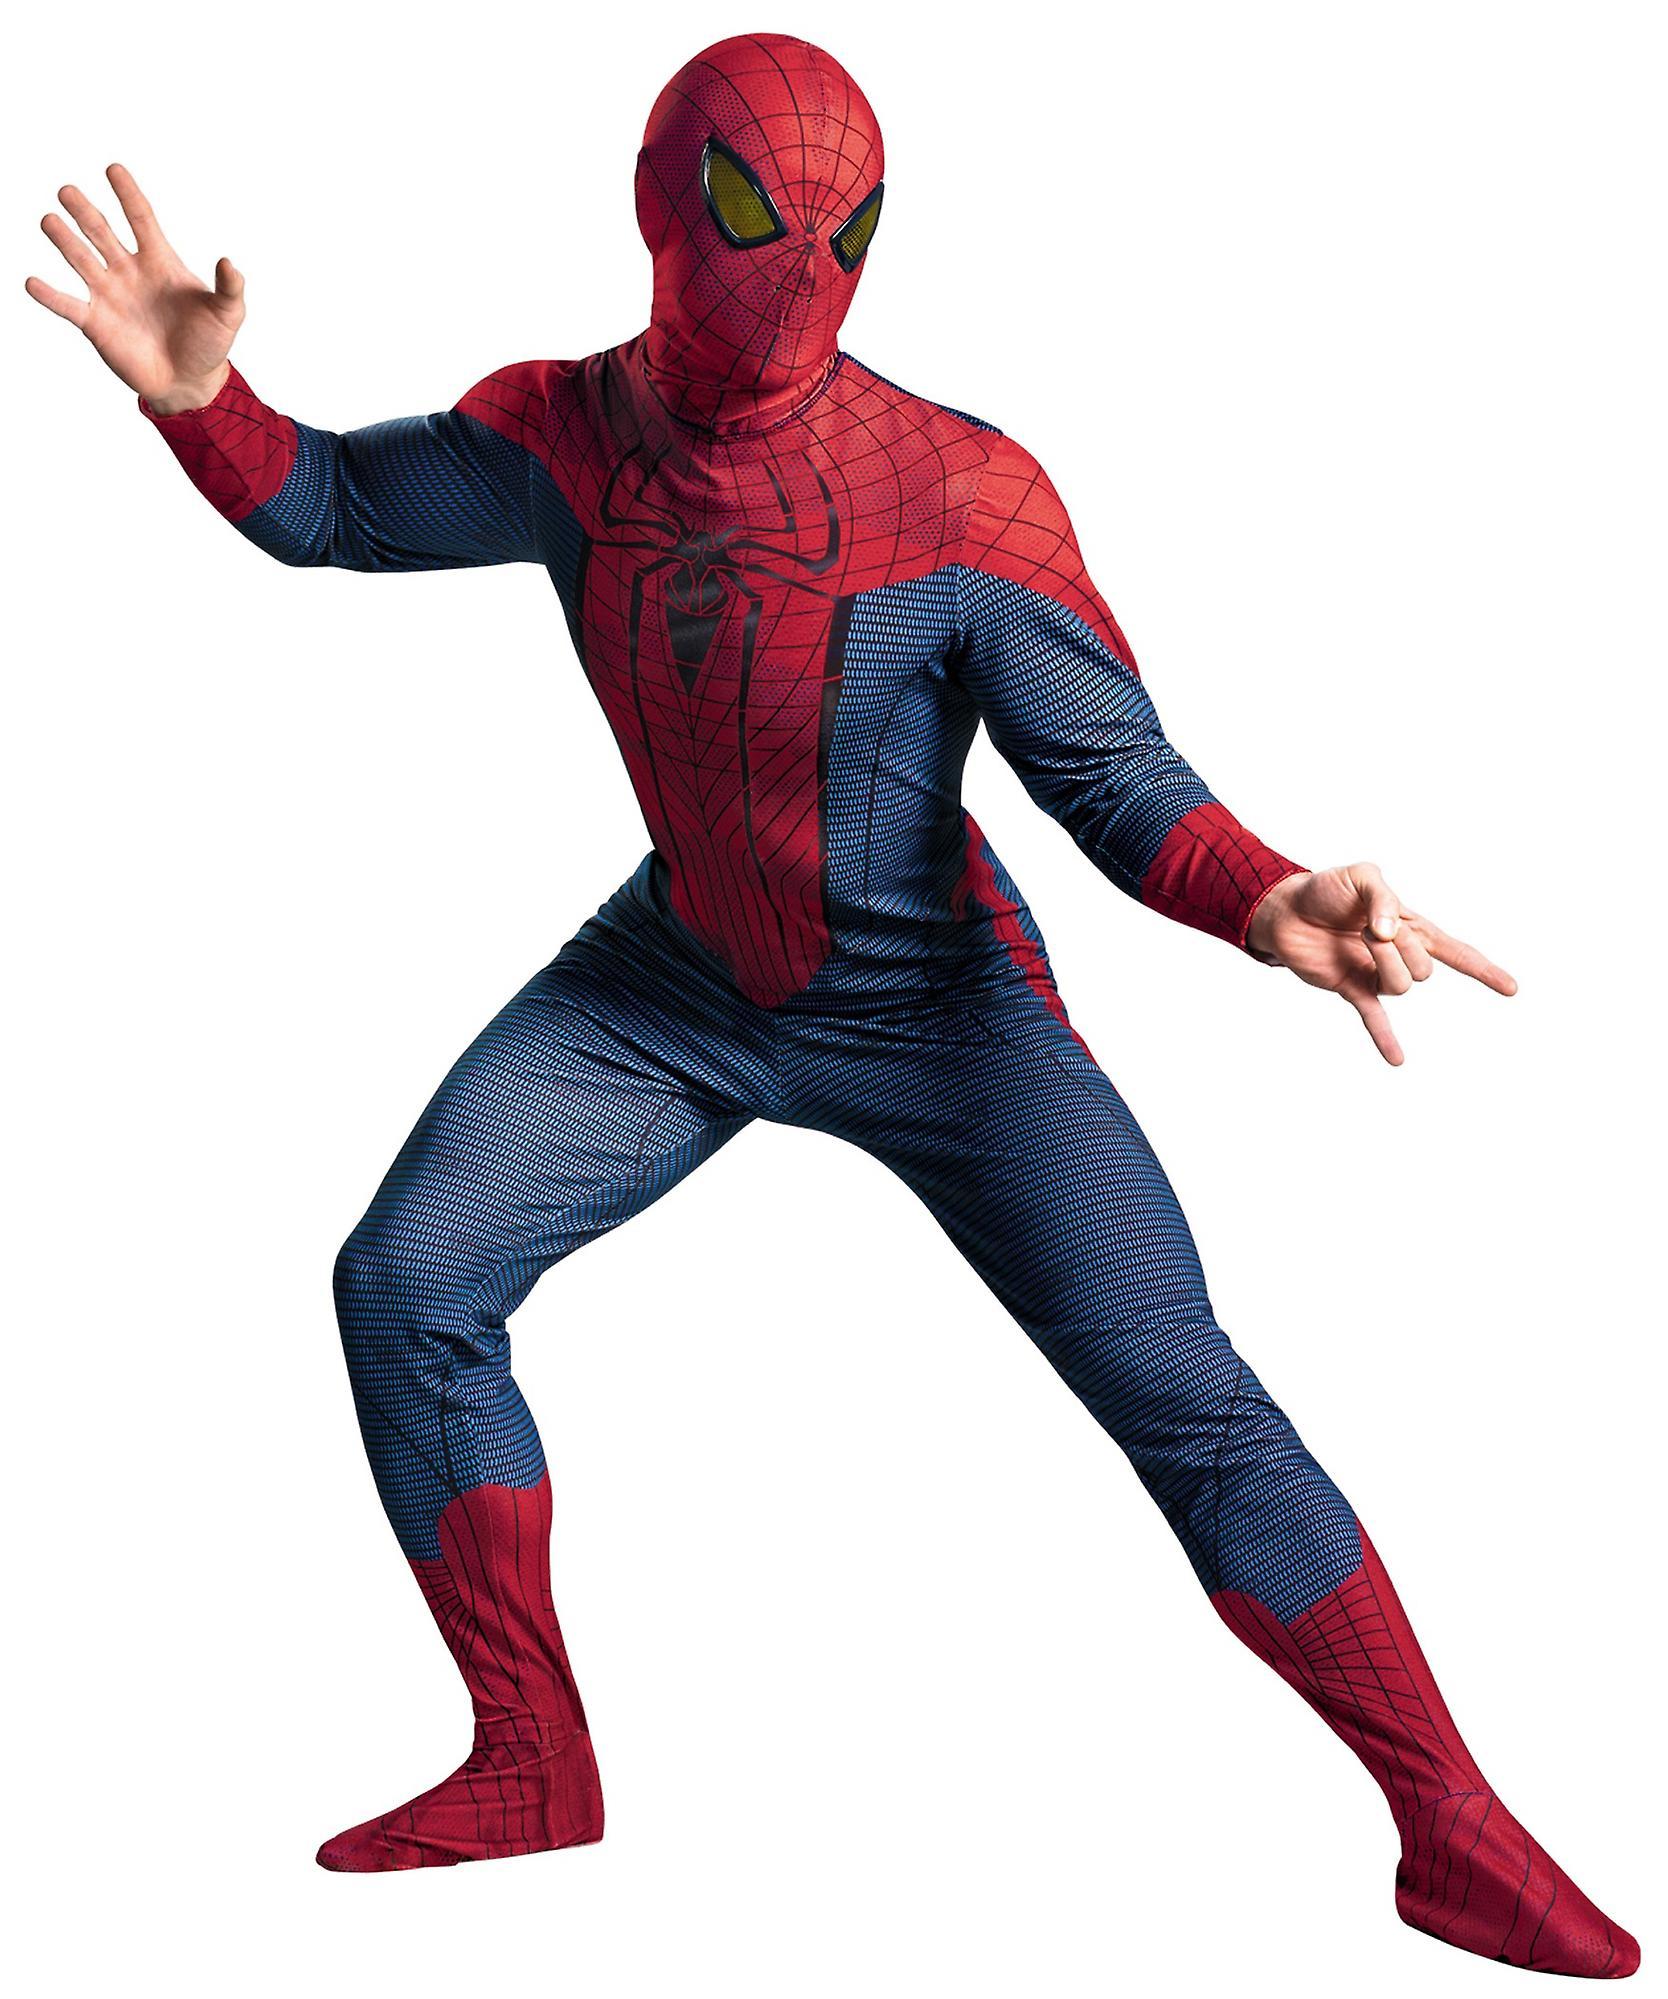 64f8009ed0b I Amazing Spider-Man Deluxe Marvel Superhero Comic Con män kostym XL ...